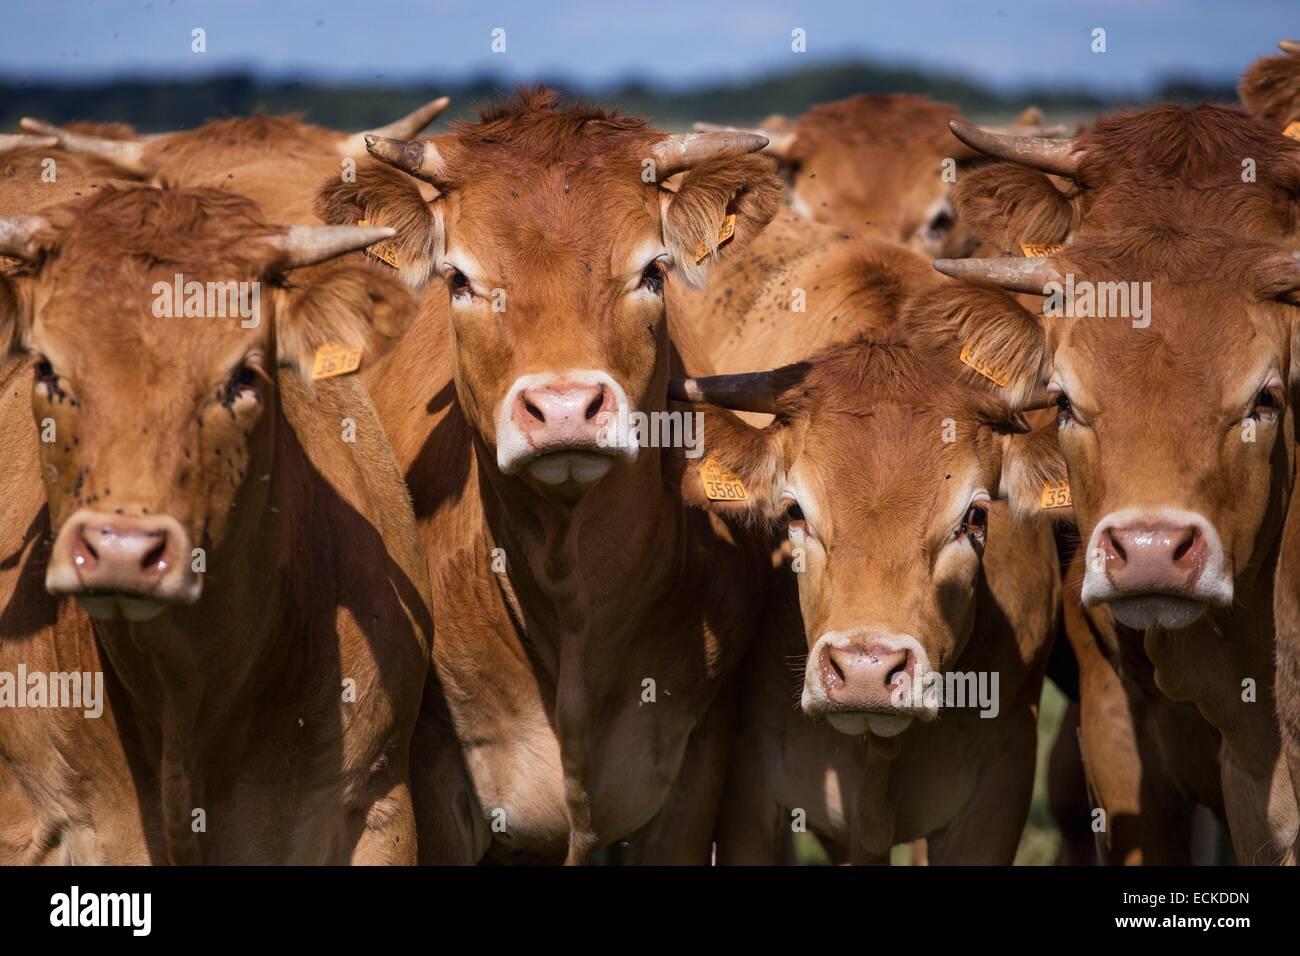 France, Charente, Limousine cows - Stock Image